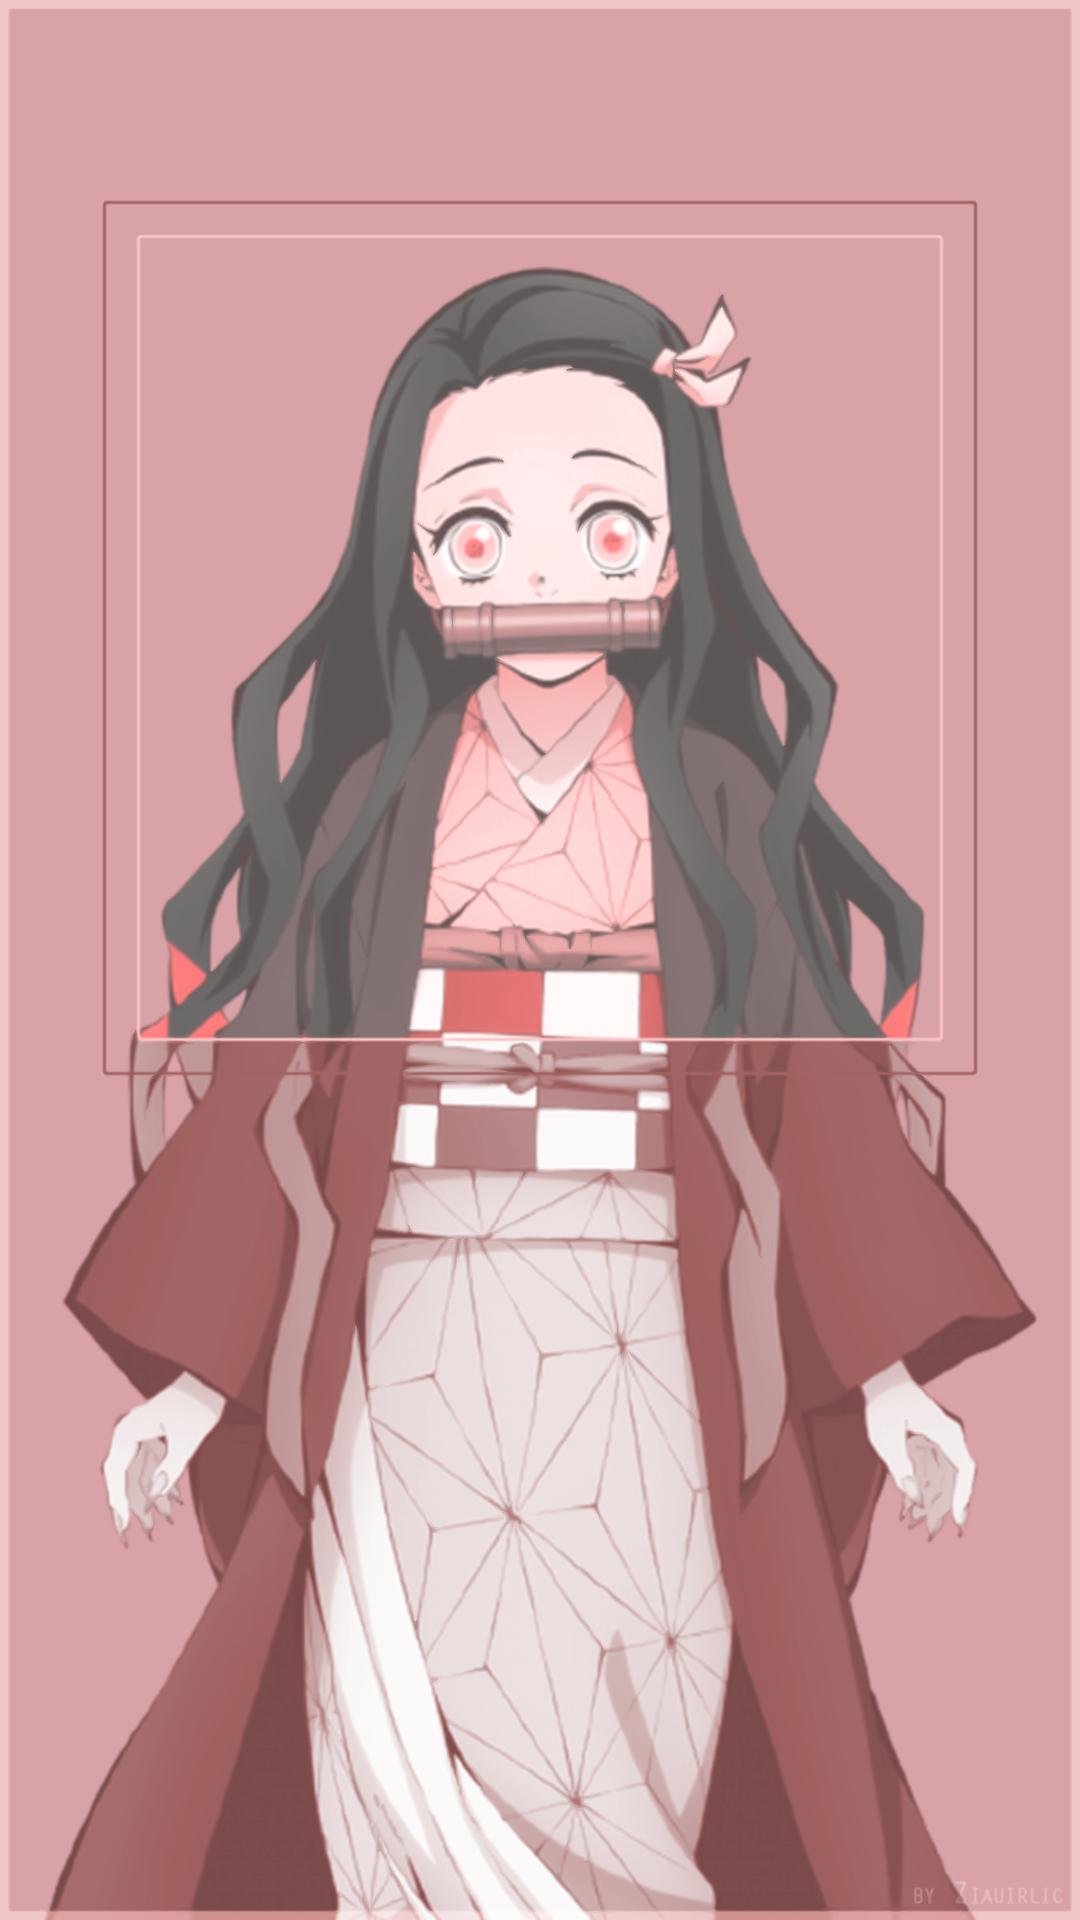 Demon Slayer Wallpaper Tumblr - Anime Wallpaper HD